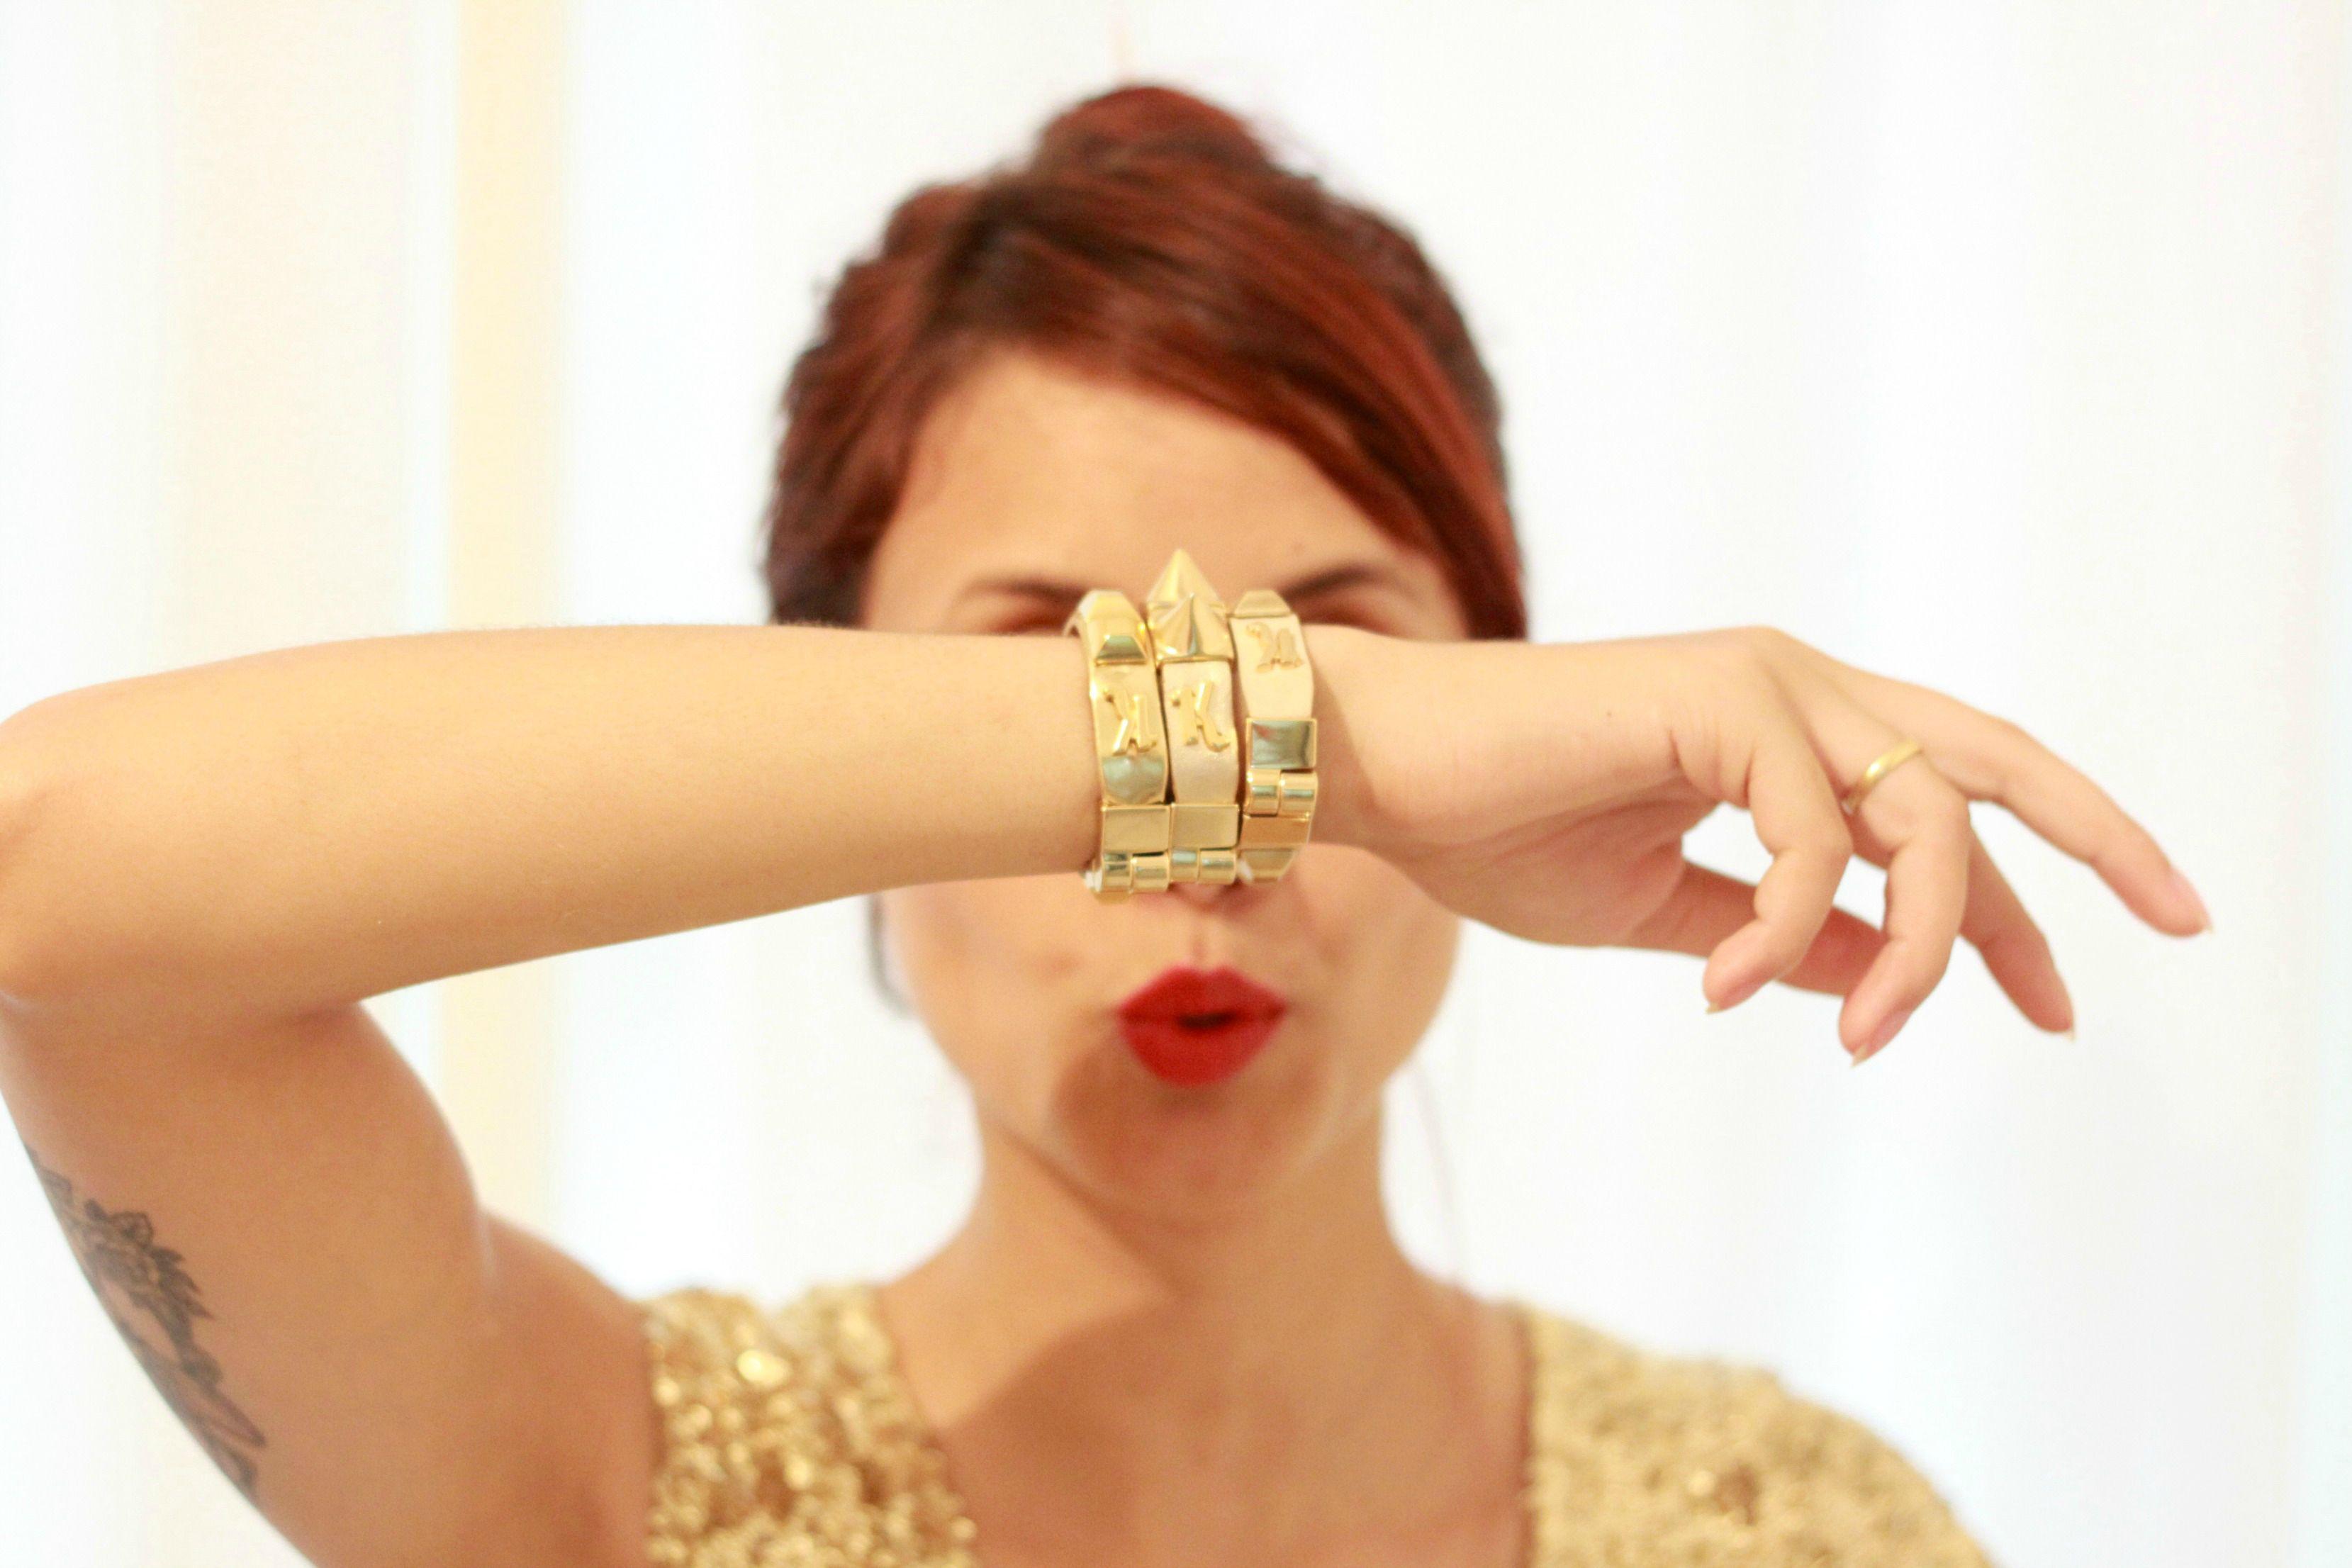 Romwe Golden Dress, Bottero Boots, Kafé Acessórios Bracelets - Hello 2014! - Glena Martins   LOOKBOOK